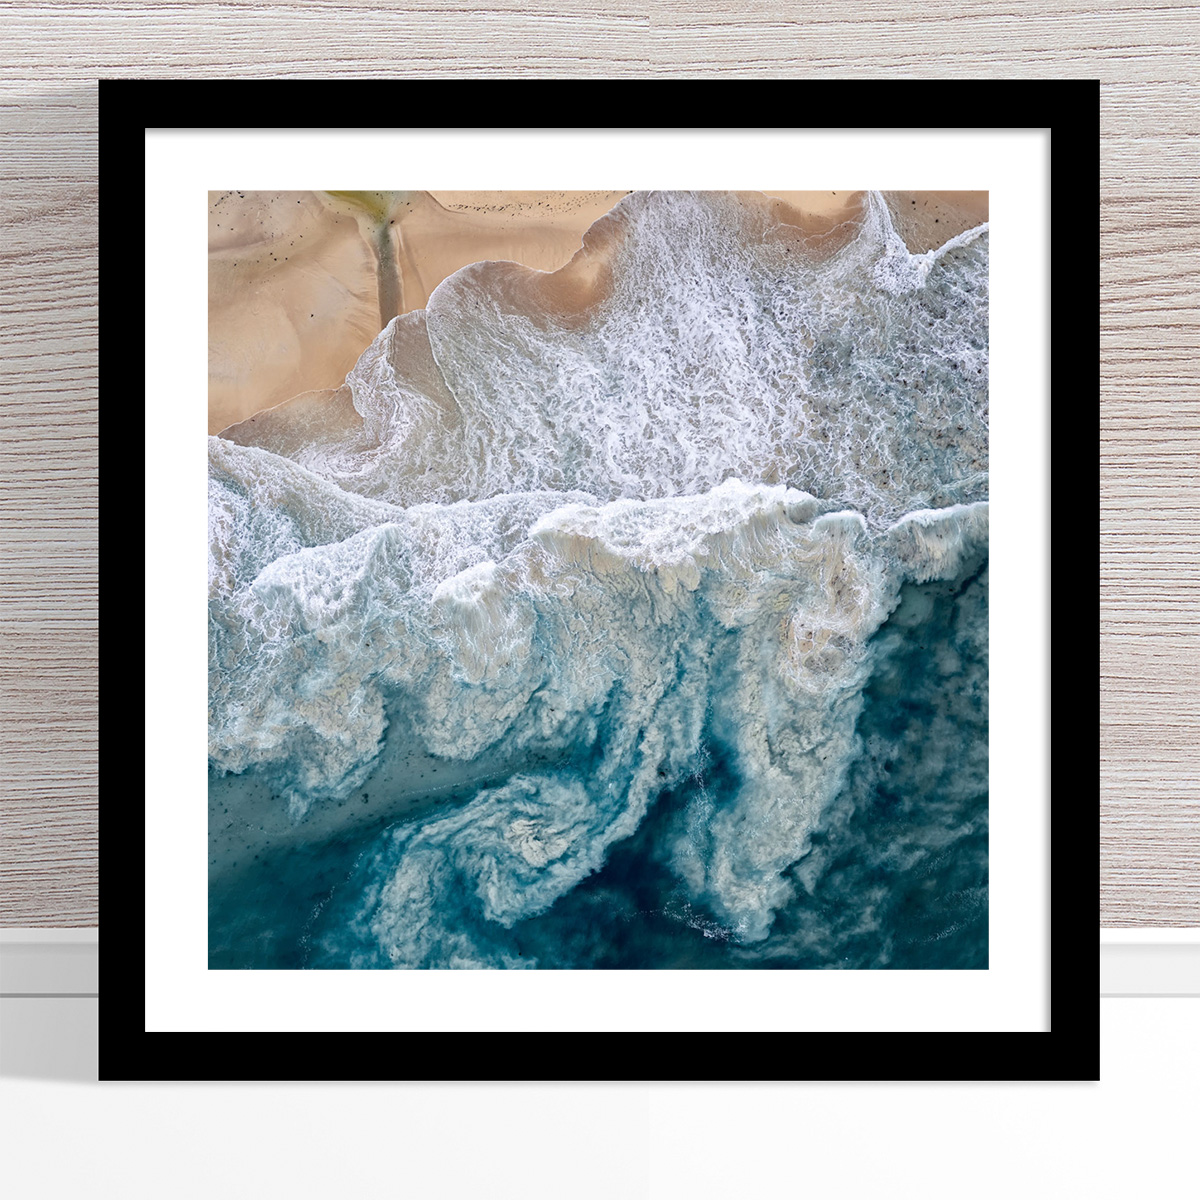 Chris Saunders - 'Aerial Coast 010' Black Frame